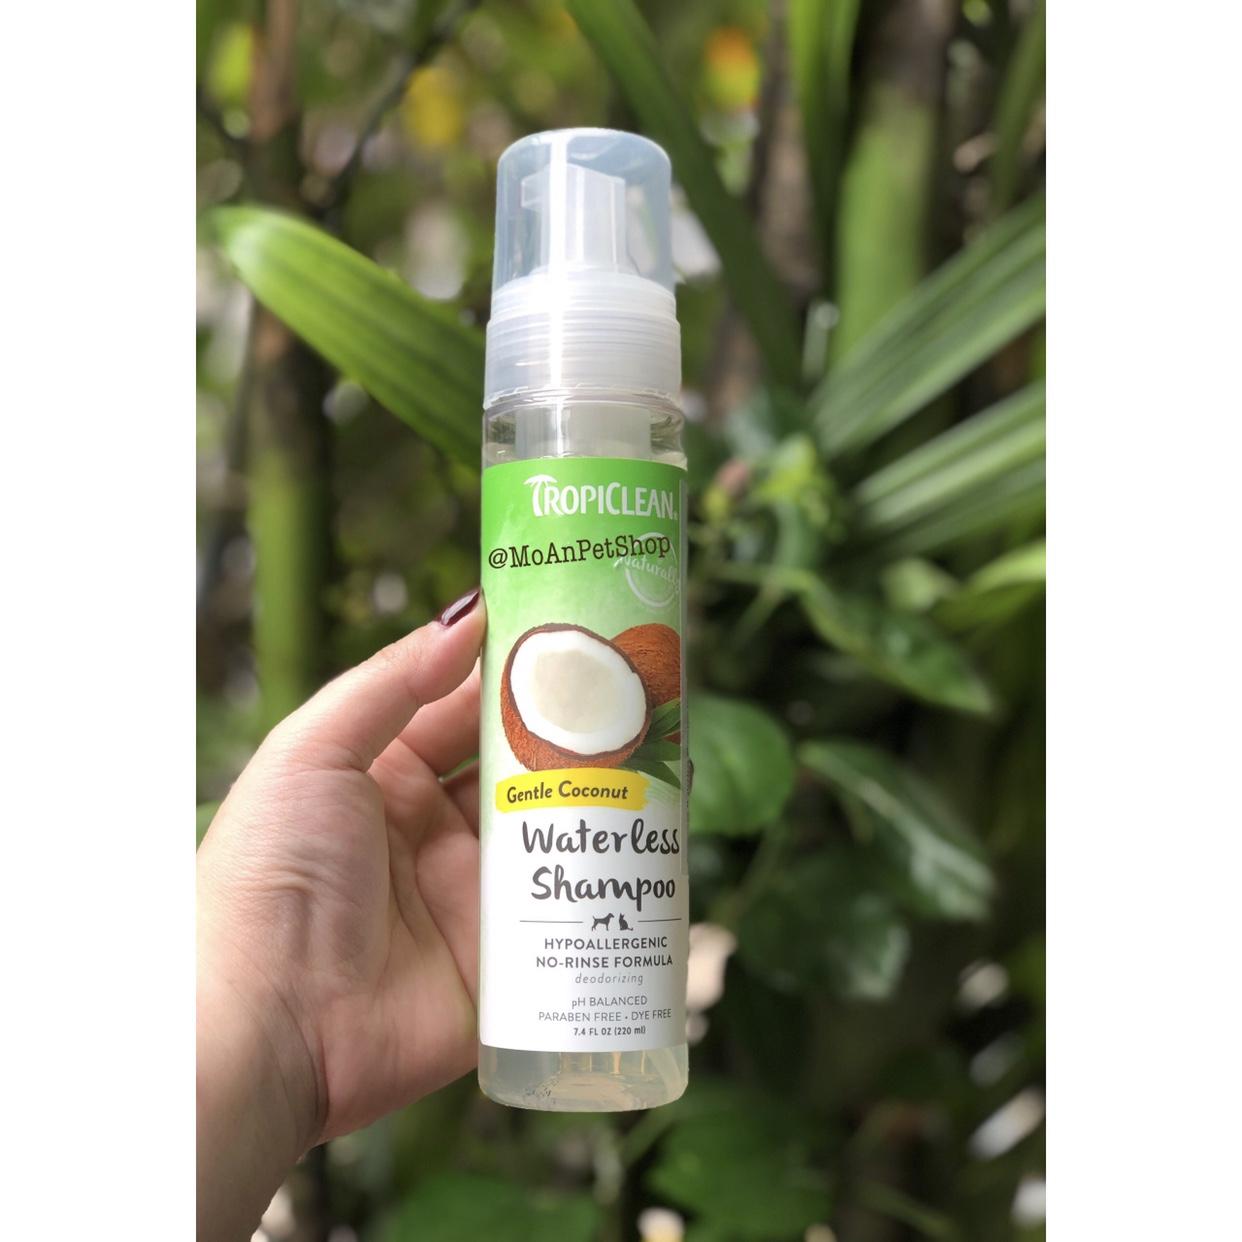 Sữa tắm khô TROPICLEAN Waterless Shampoo Hypoallergenic [Dạng bọt foam] 220ml